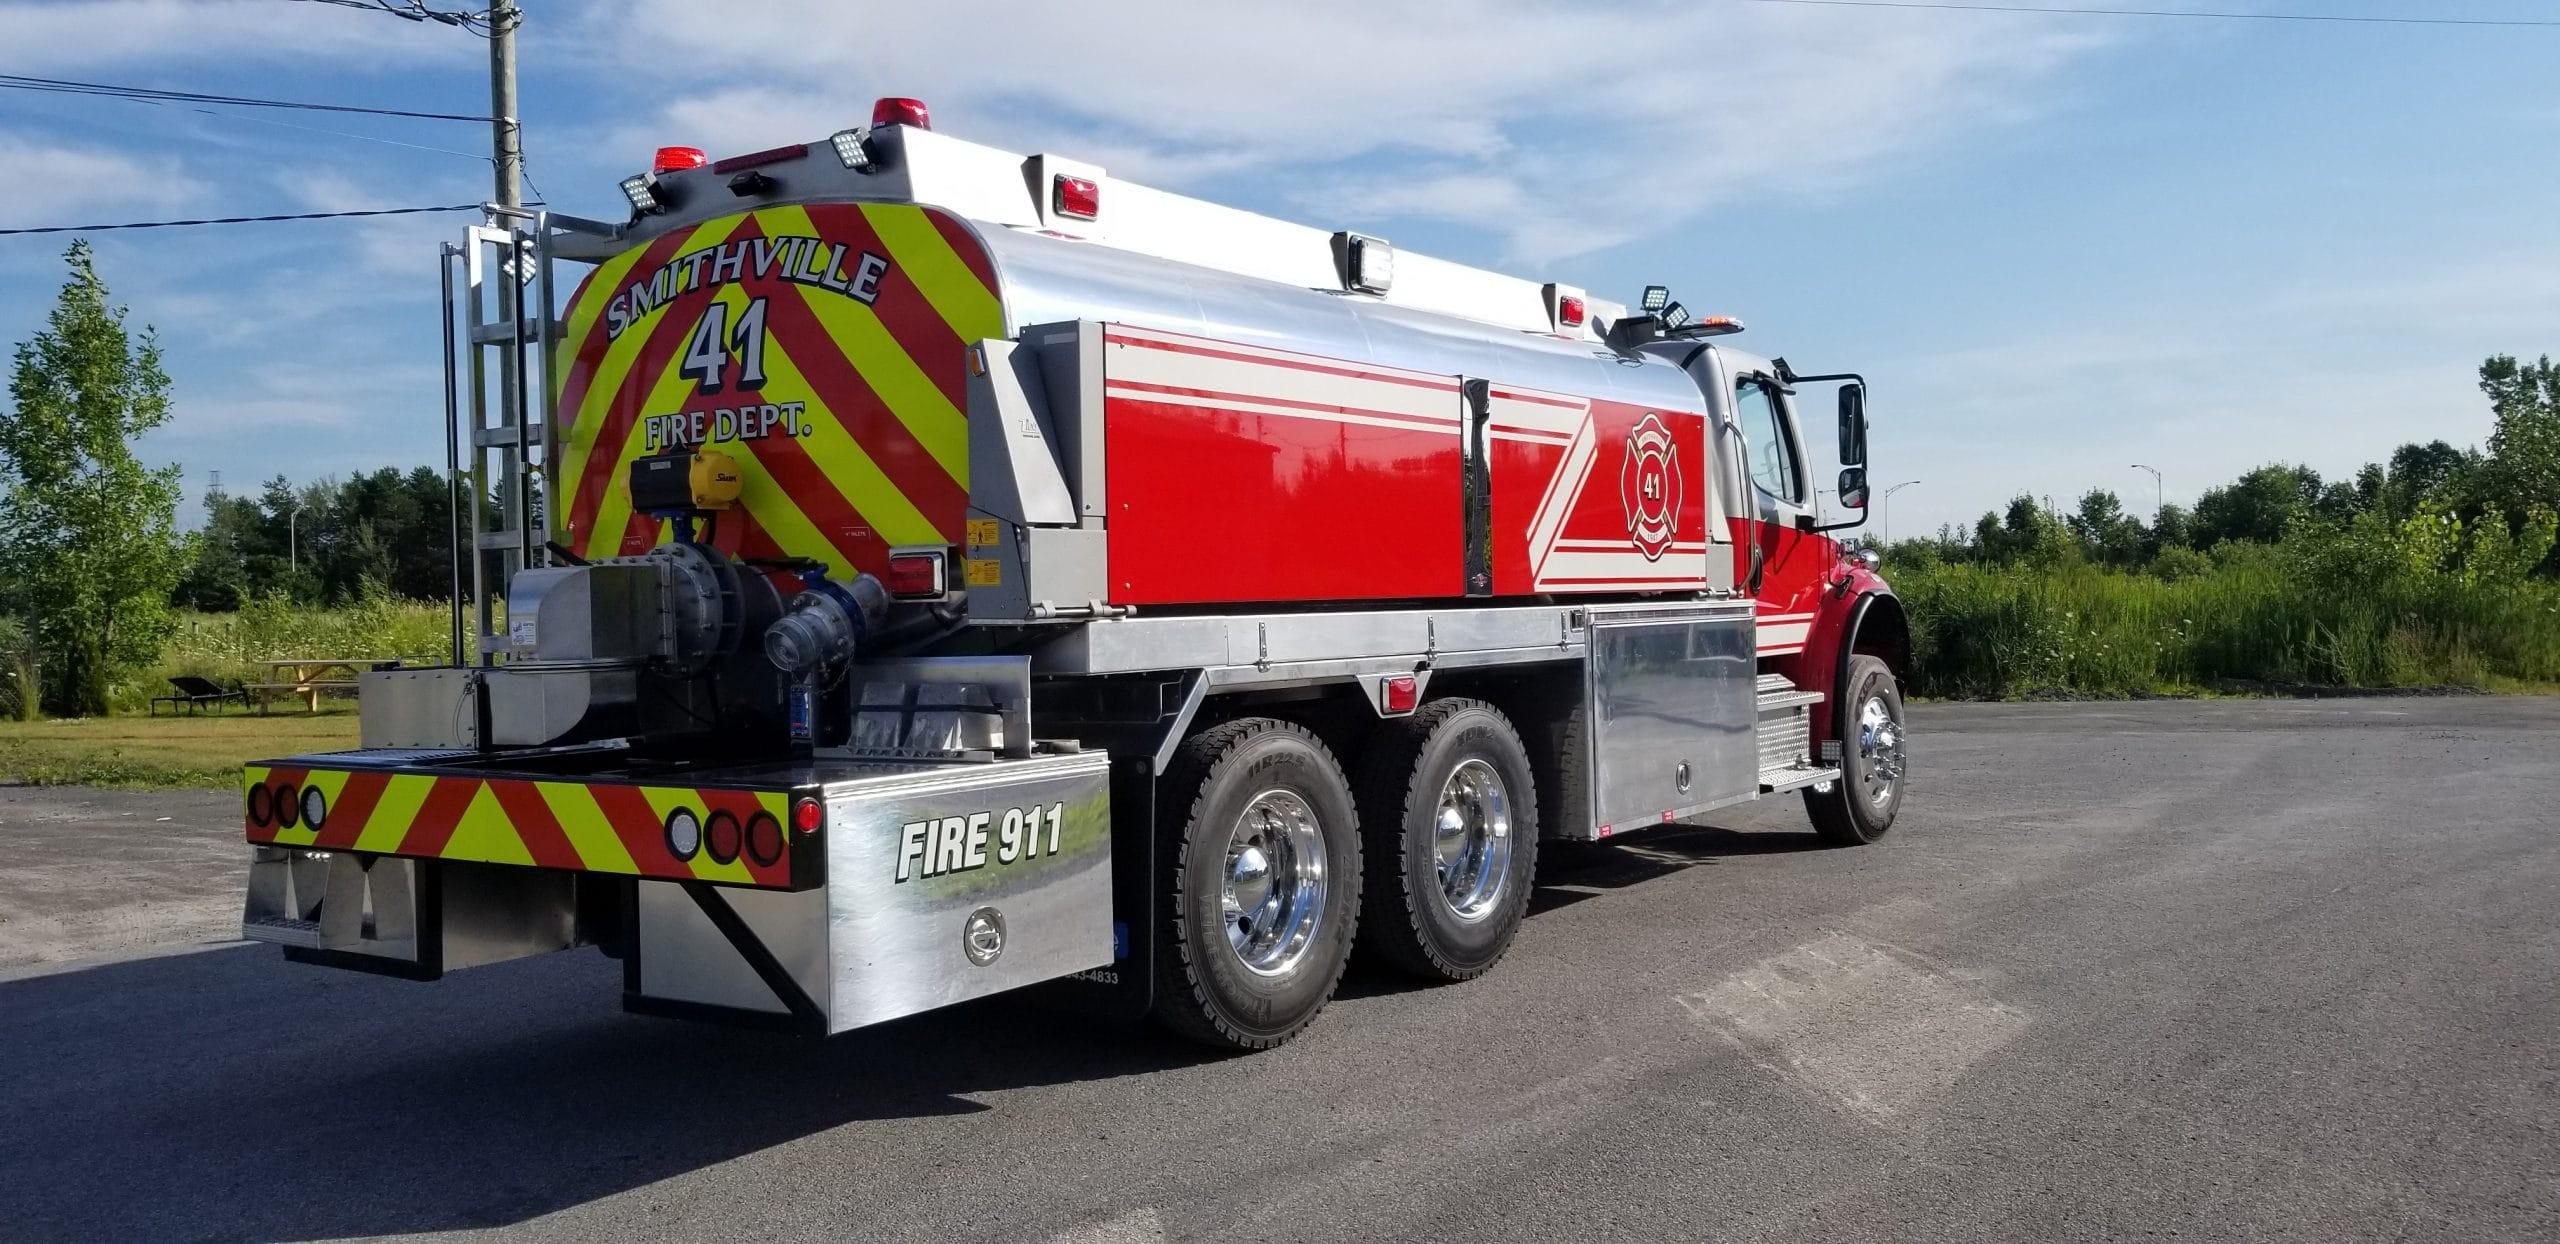 M2 Fright. Brake Release Tandem Axle Truck Camions Helie Of M2 Fright. Brake Release